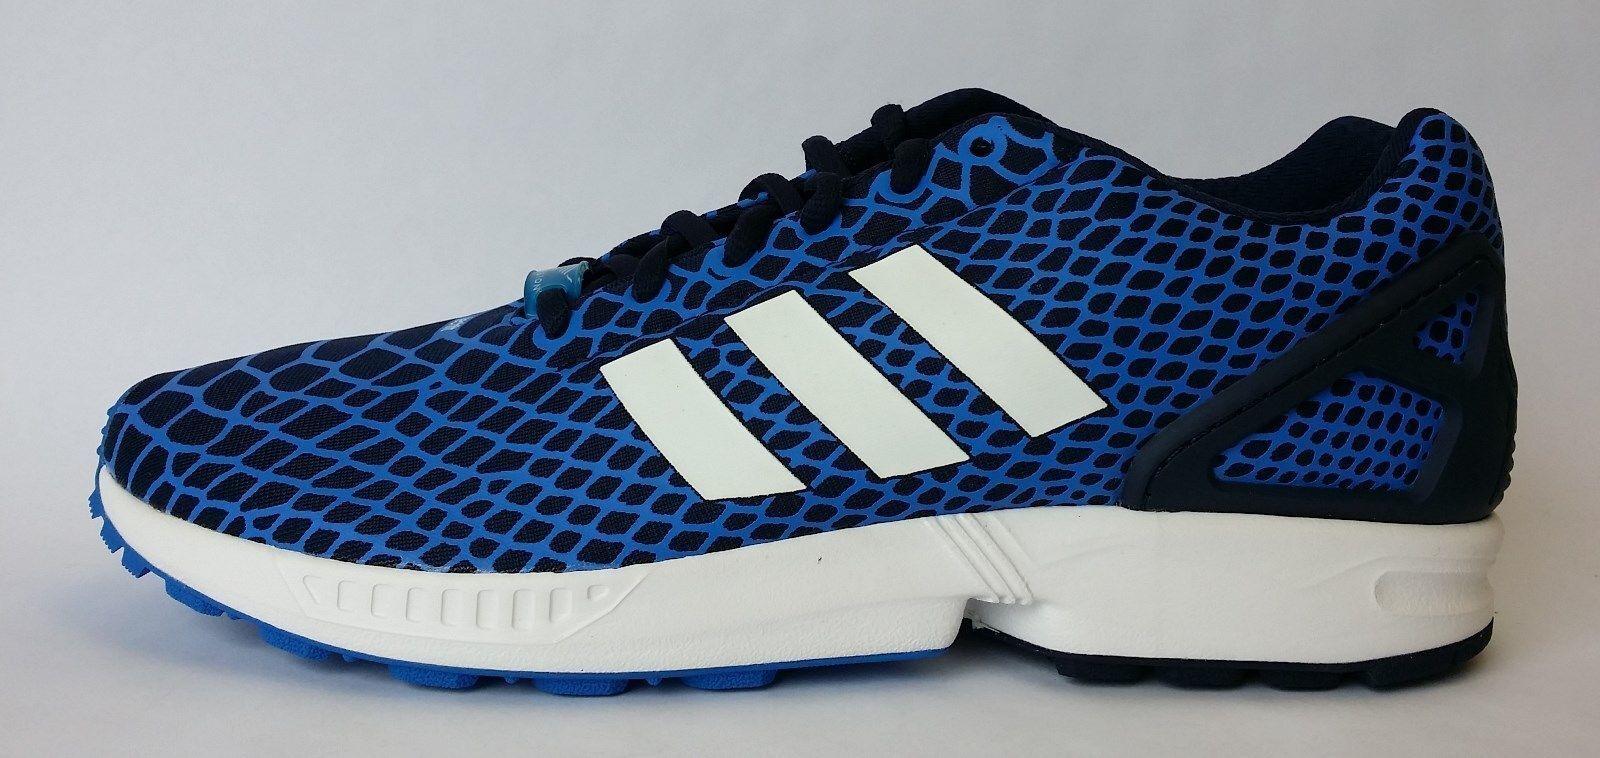 Adidas Zx Fluks Svart Mens Størrelse 9 IyS511